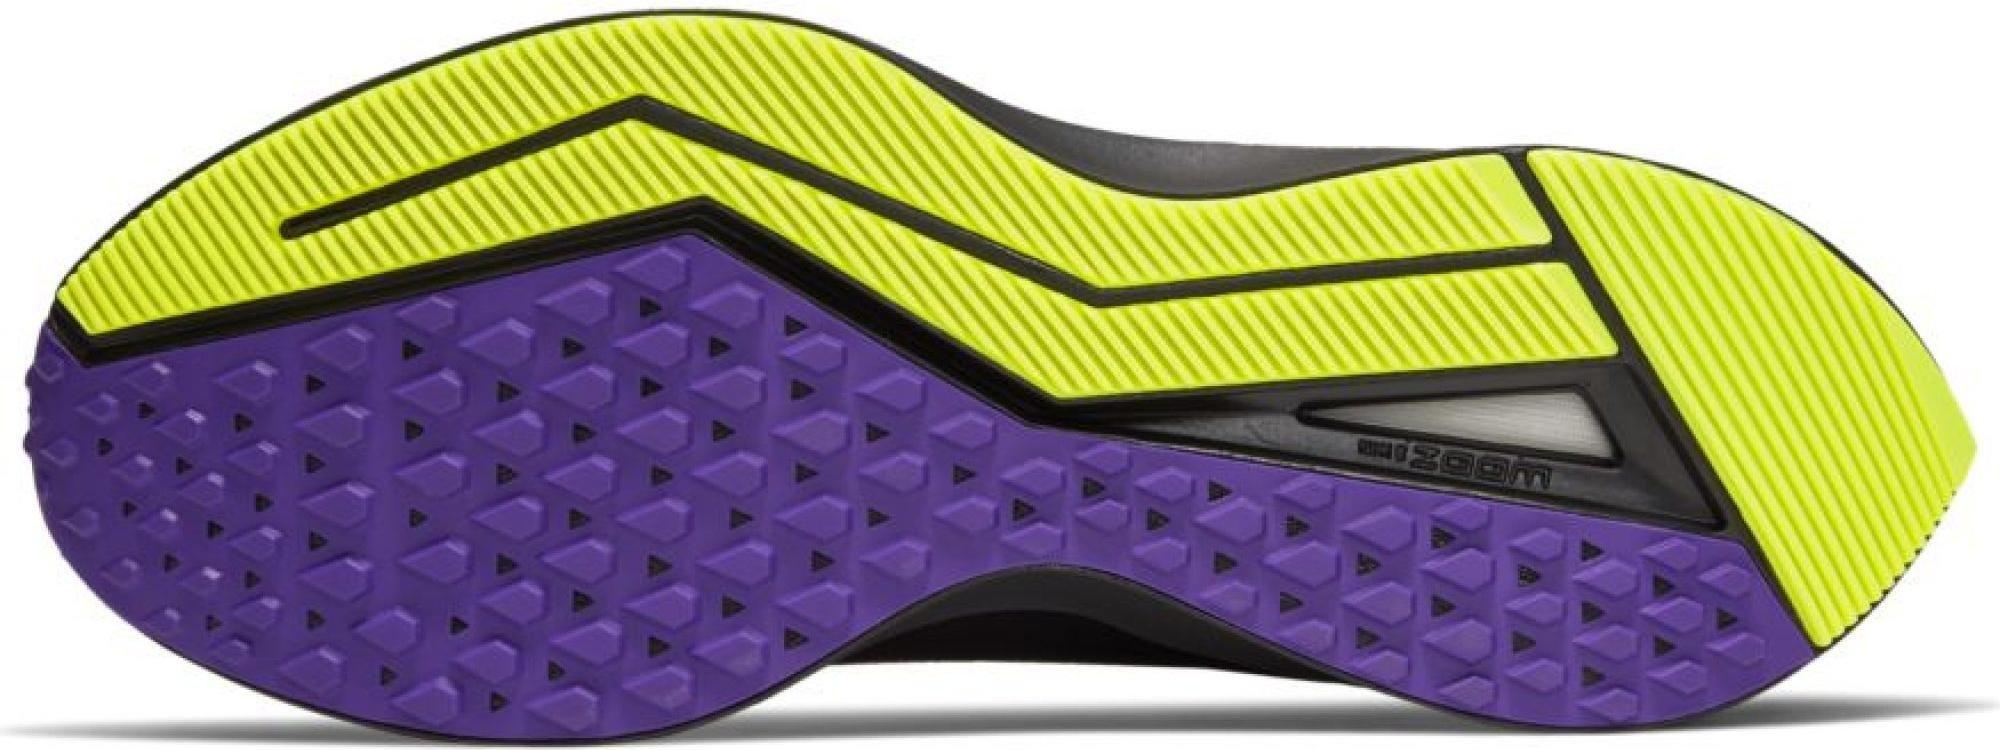 Running shoes Nike ZOOM WINFLO 6 SHIELD